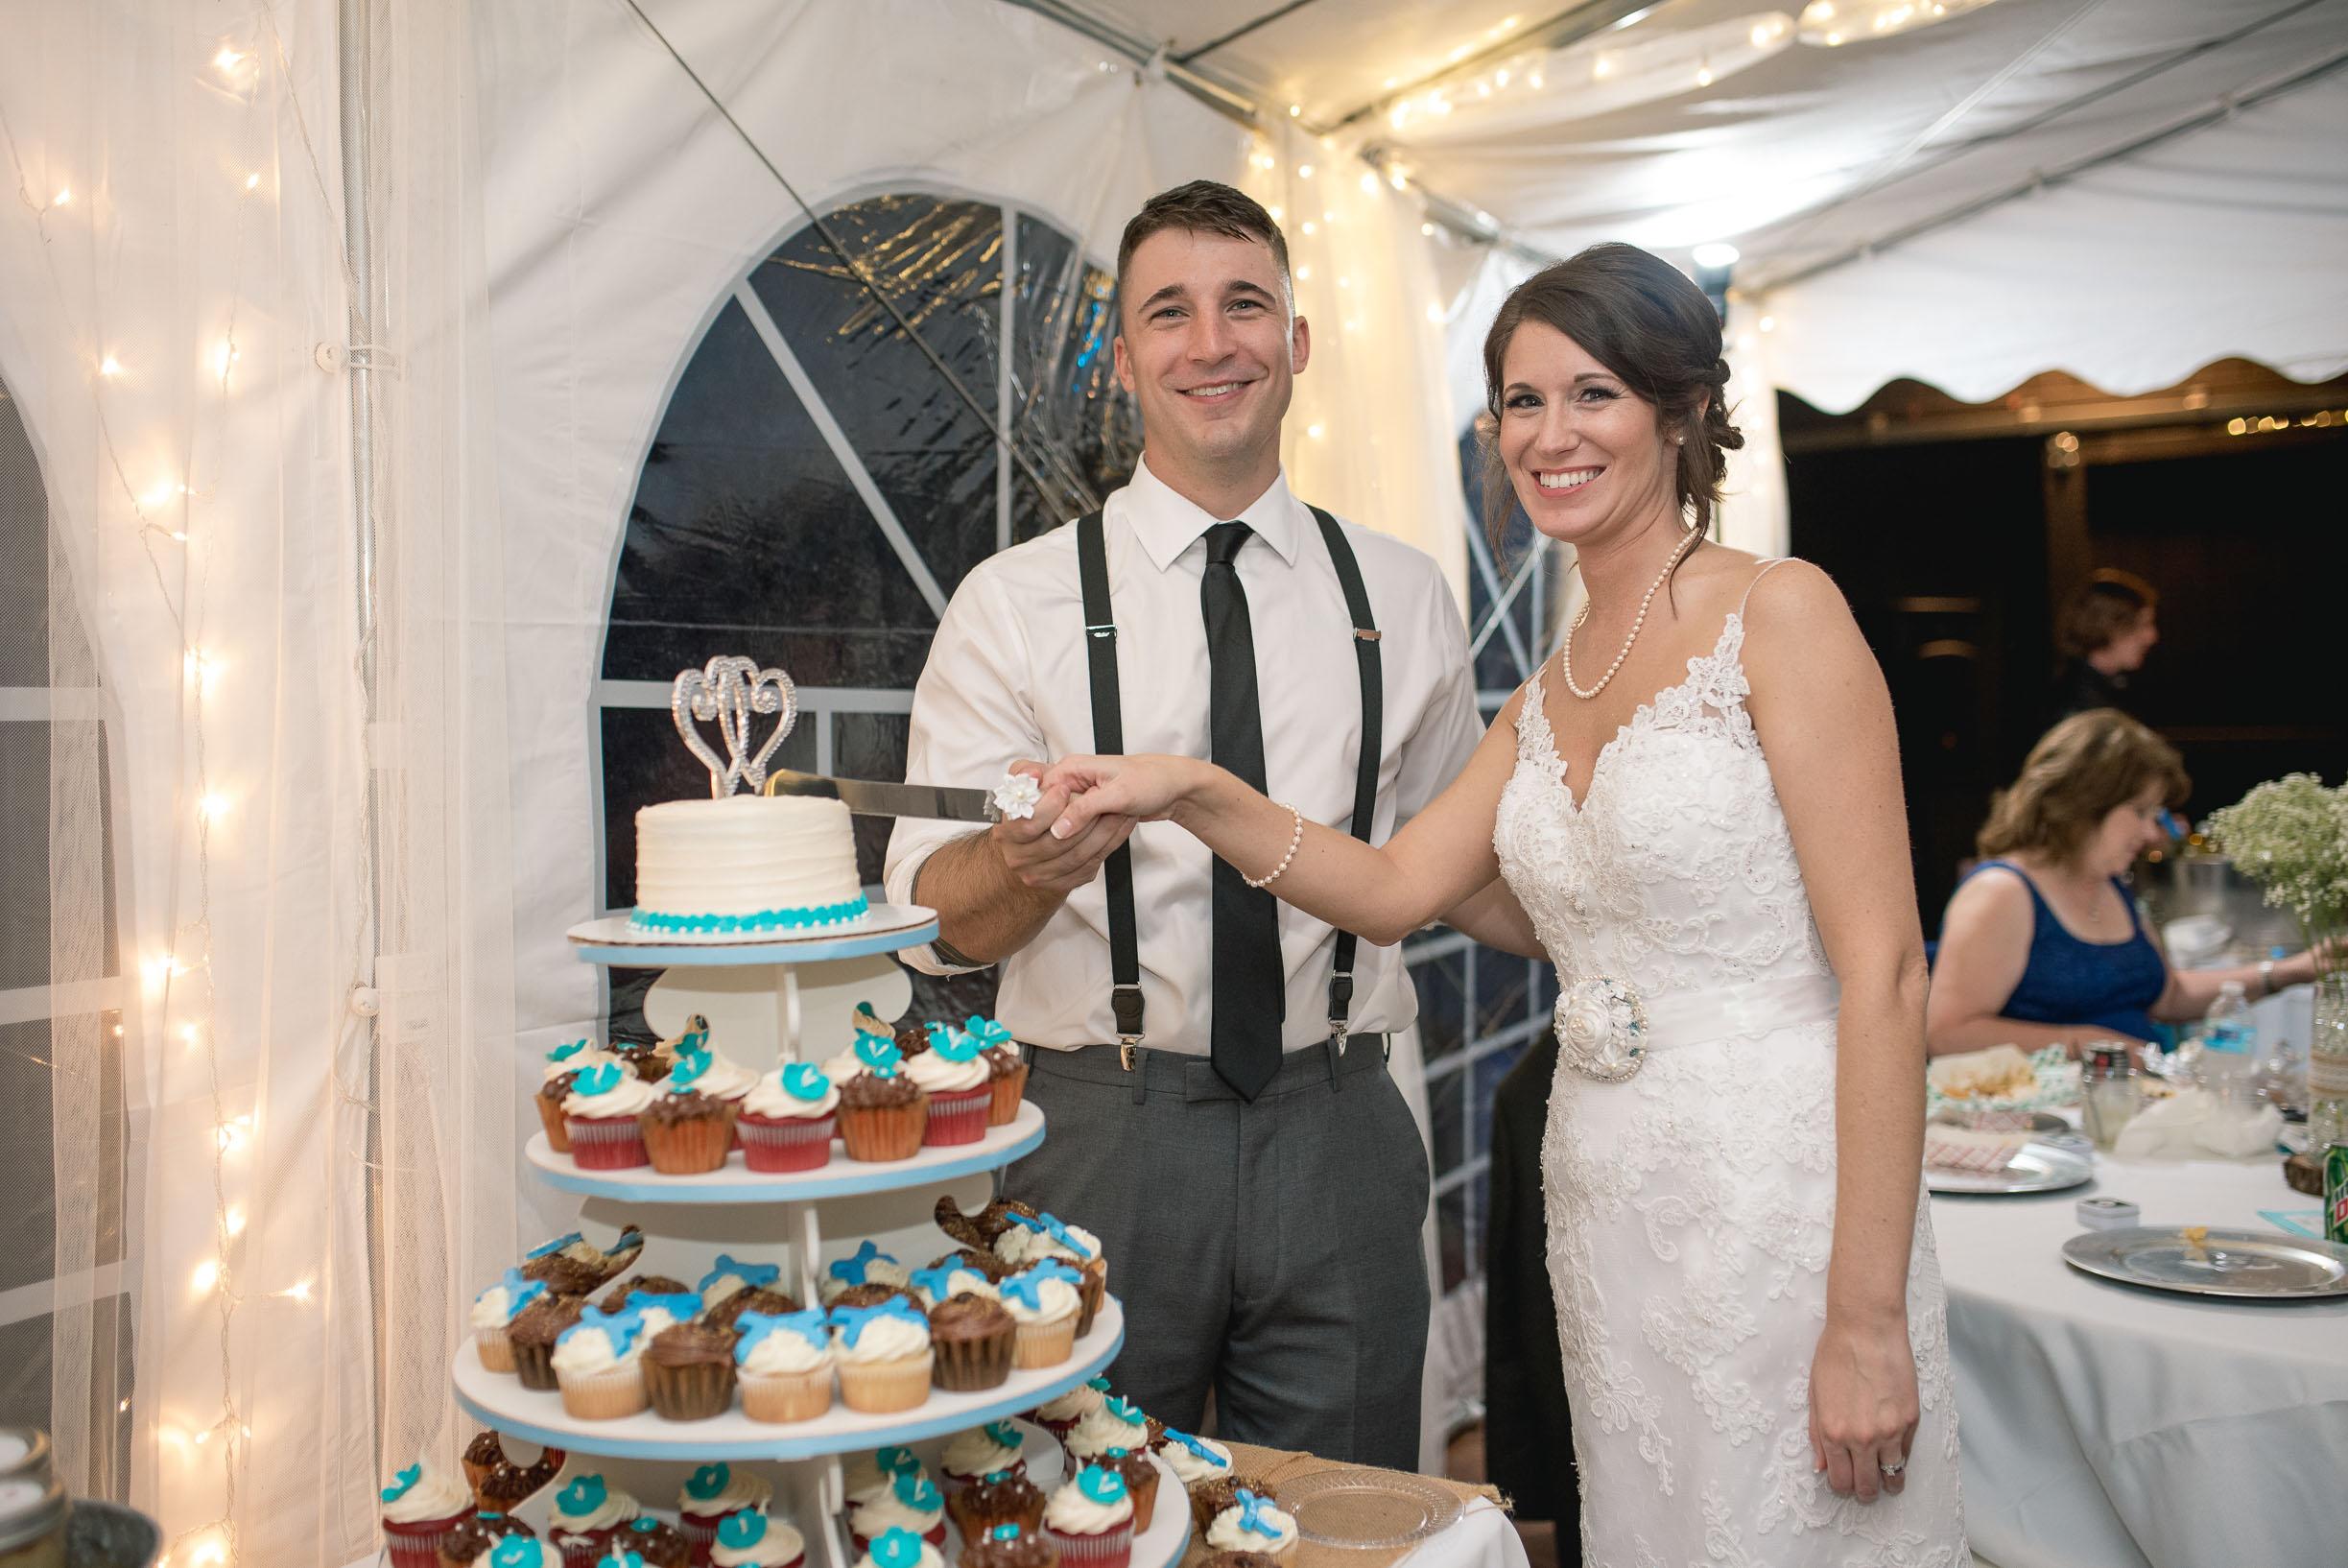 057Portland Wedding Photographer timothy capp.jpg